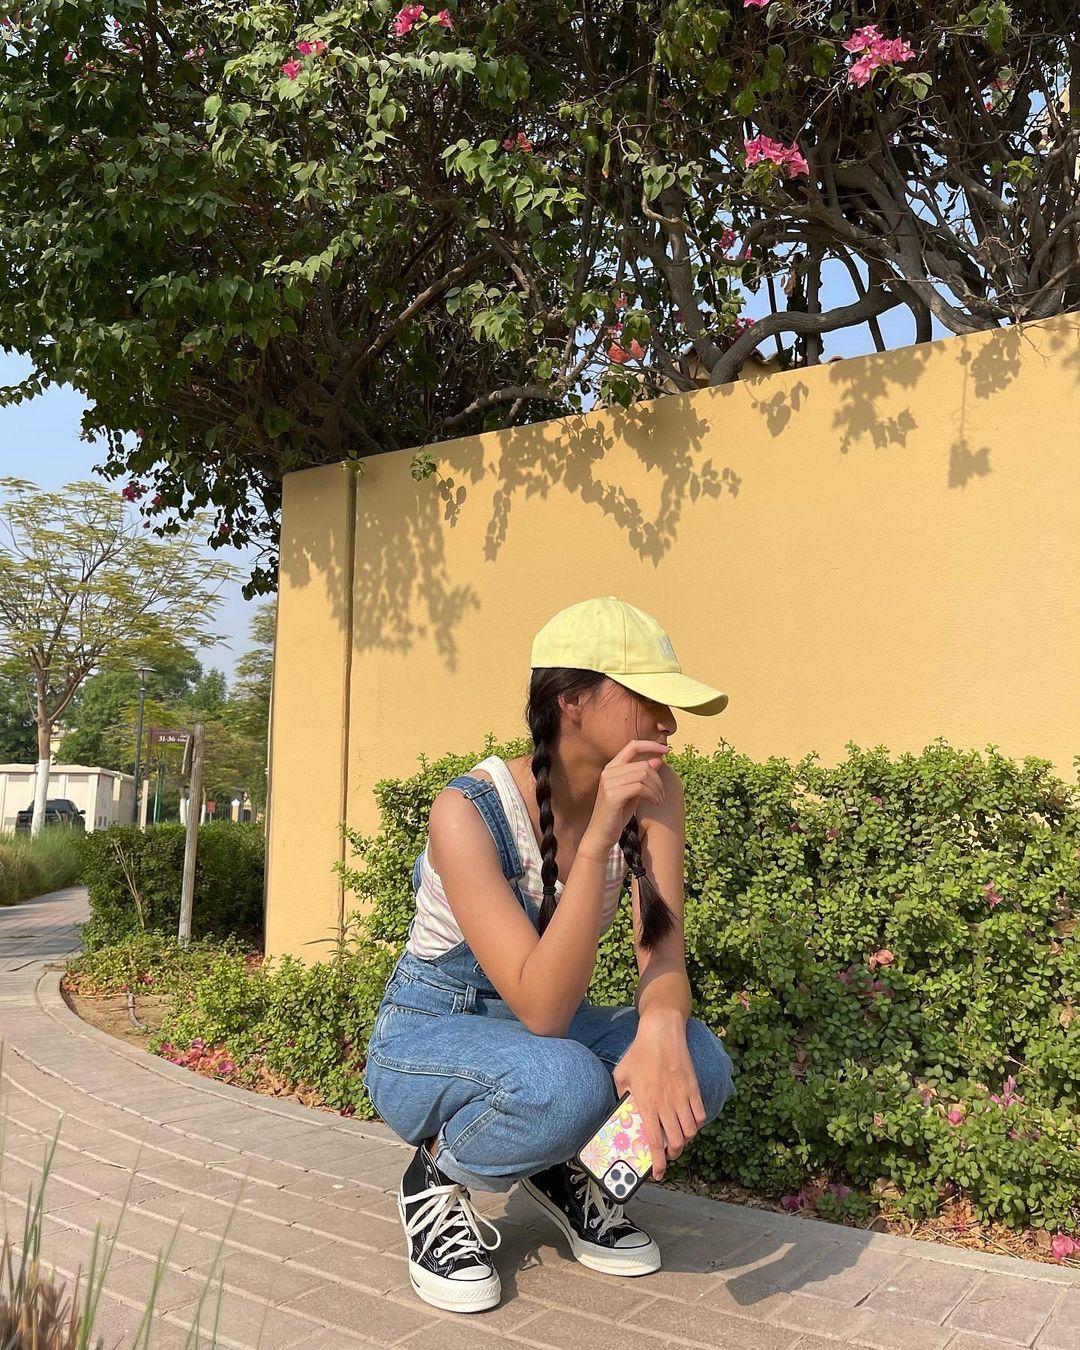 angel secillano shy girl poses